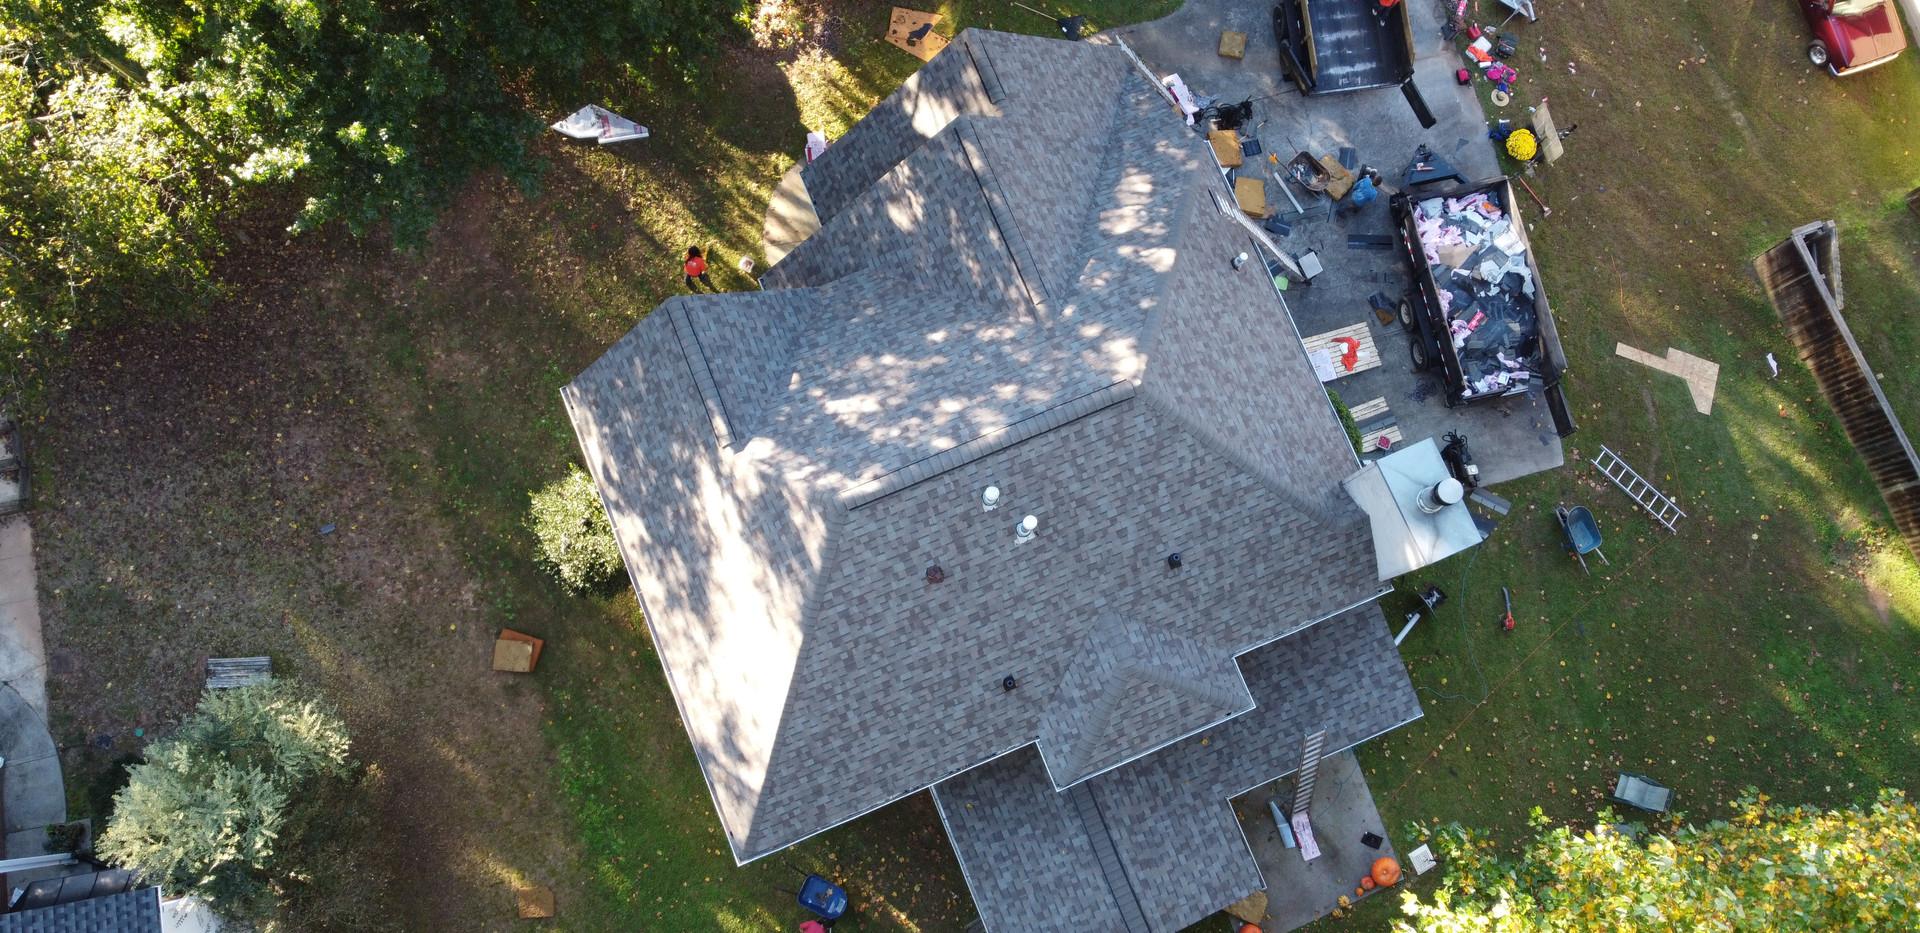 Marrietta roofing